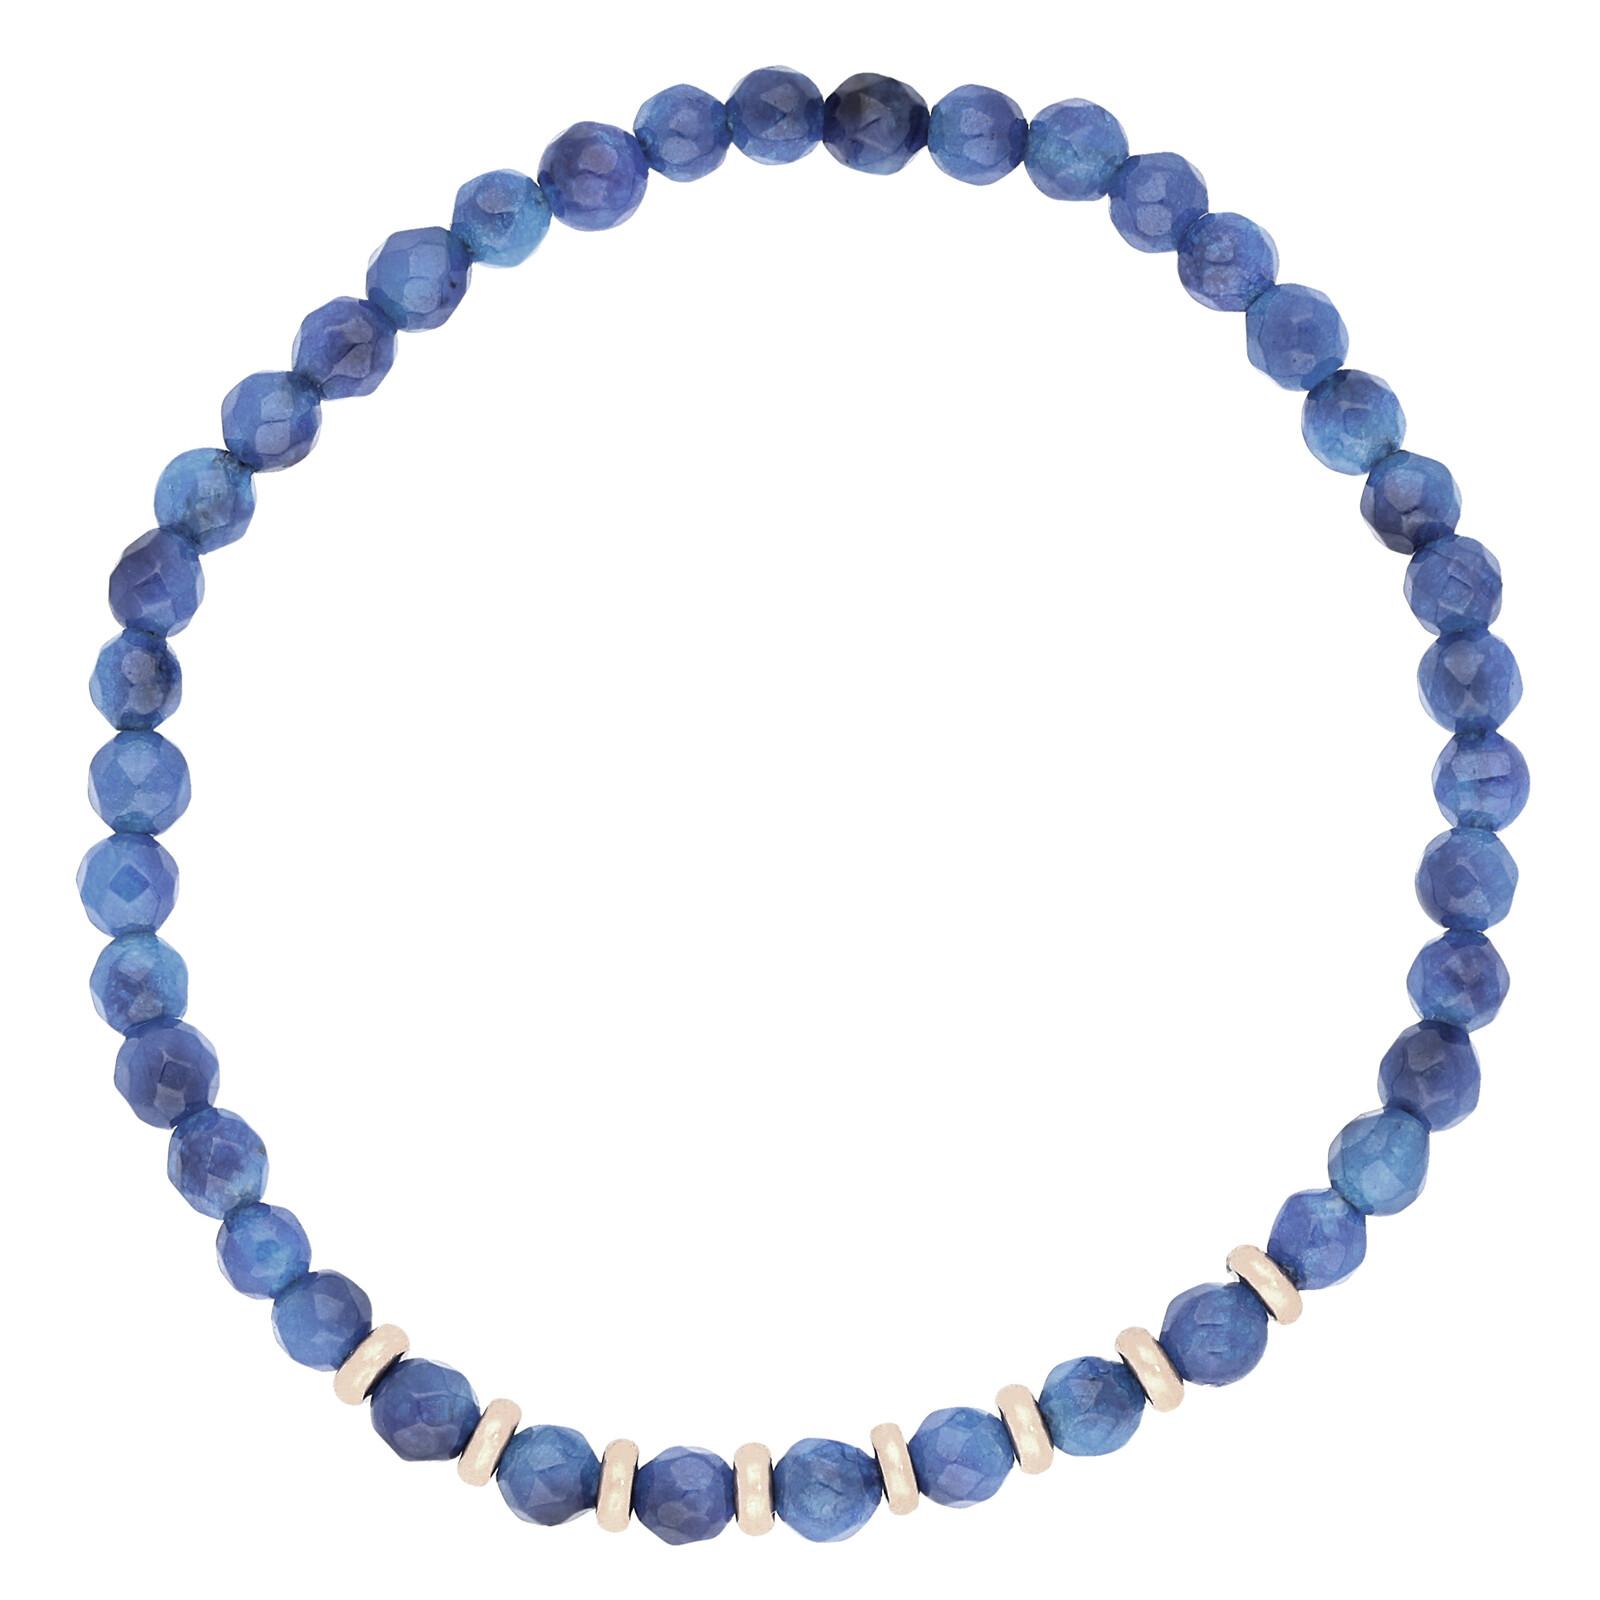 Armband Jade blau rosevergoldet echt Silber